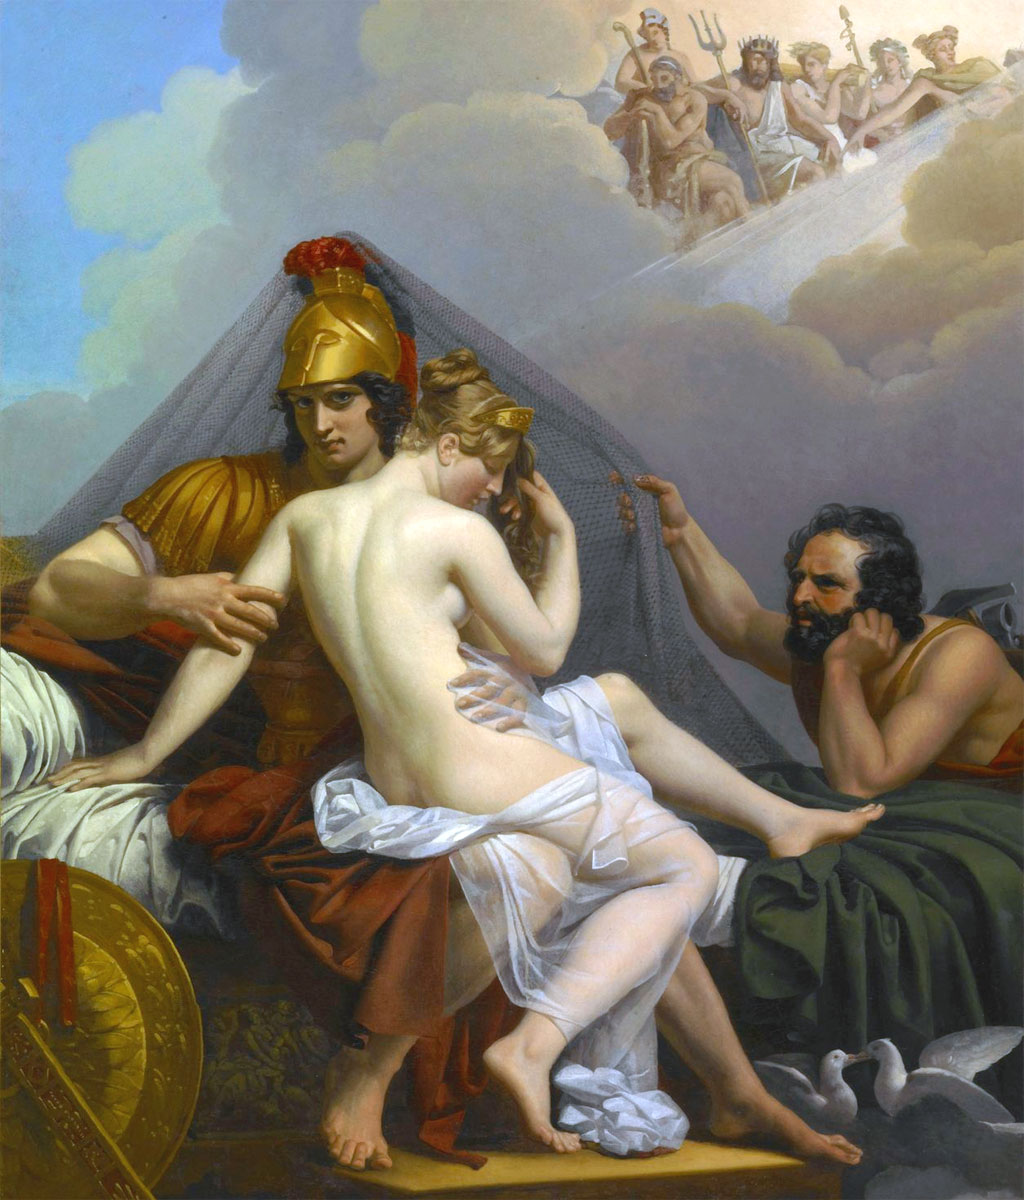 Marte e Venere sorpresi da vulcano (Efesto) - Alexandre Charles Guillemot - 1827